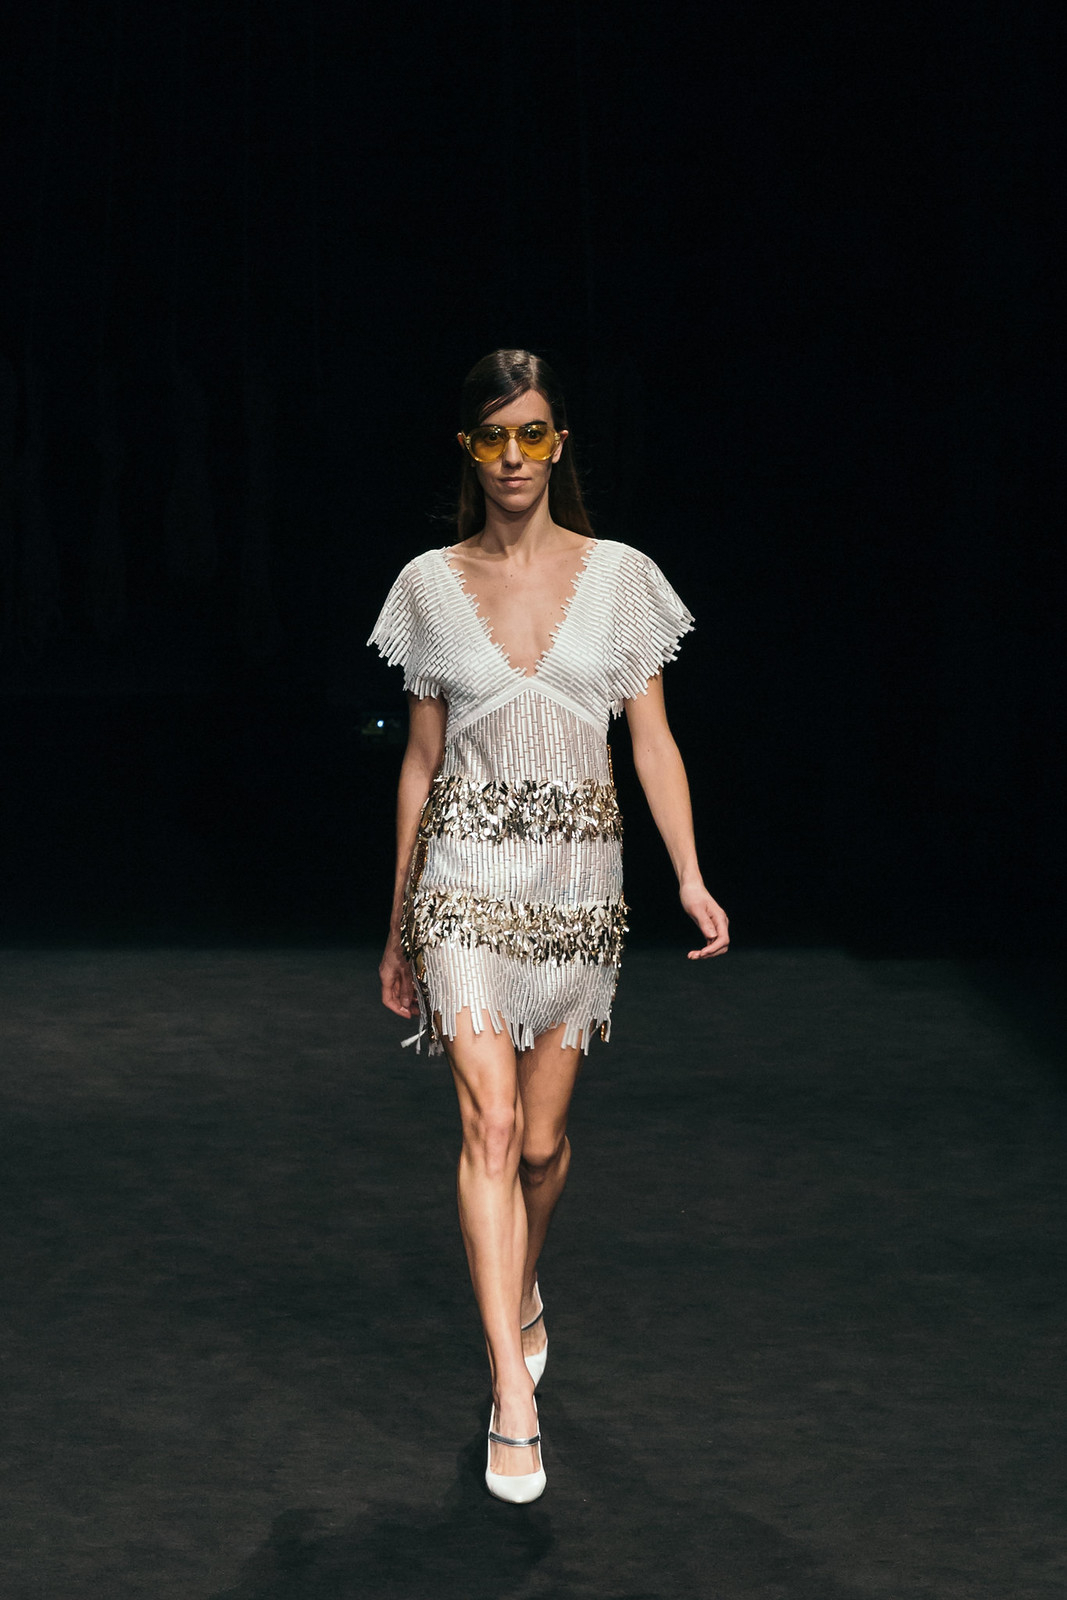 Jessie Chanes - Seams for a desire - 080 Bacelona Fashion #080bcnfasion -8